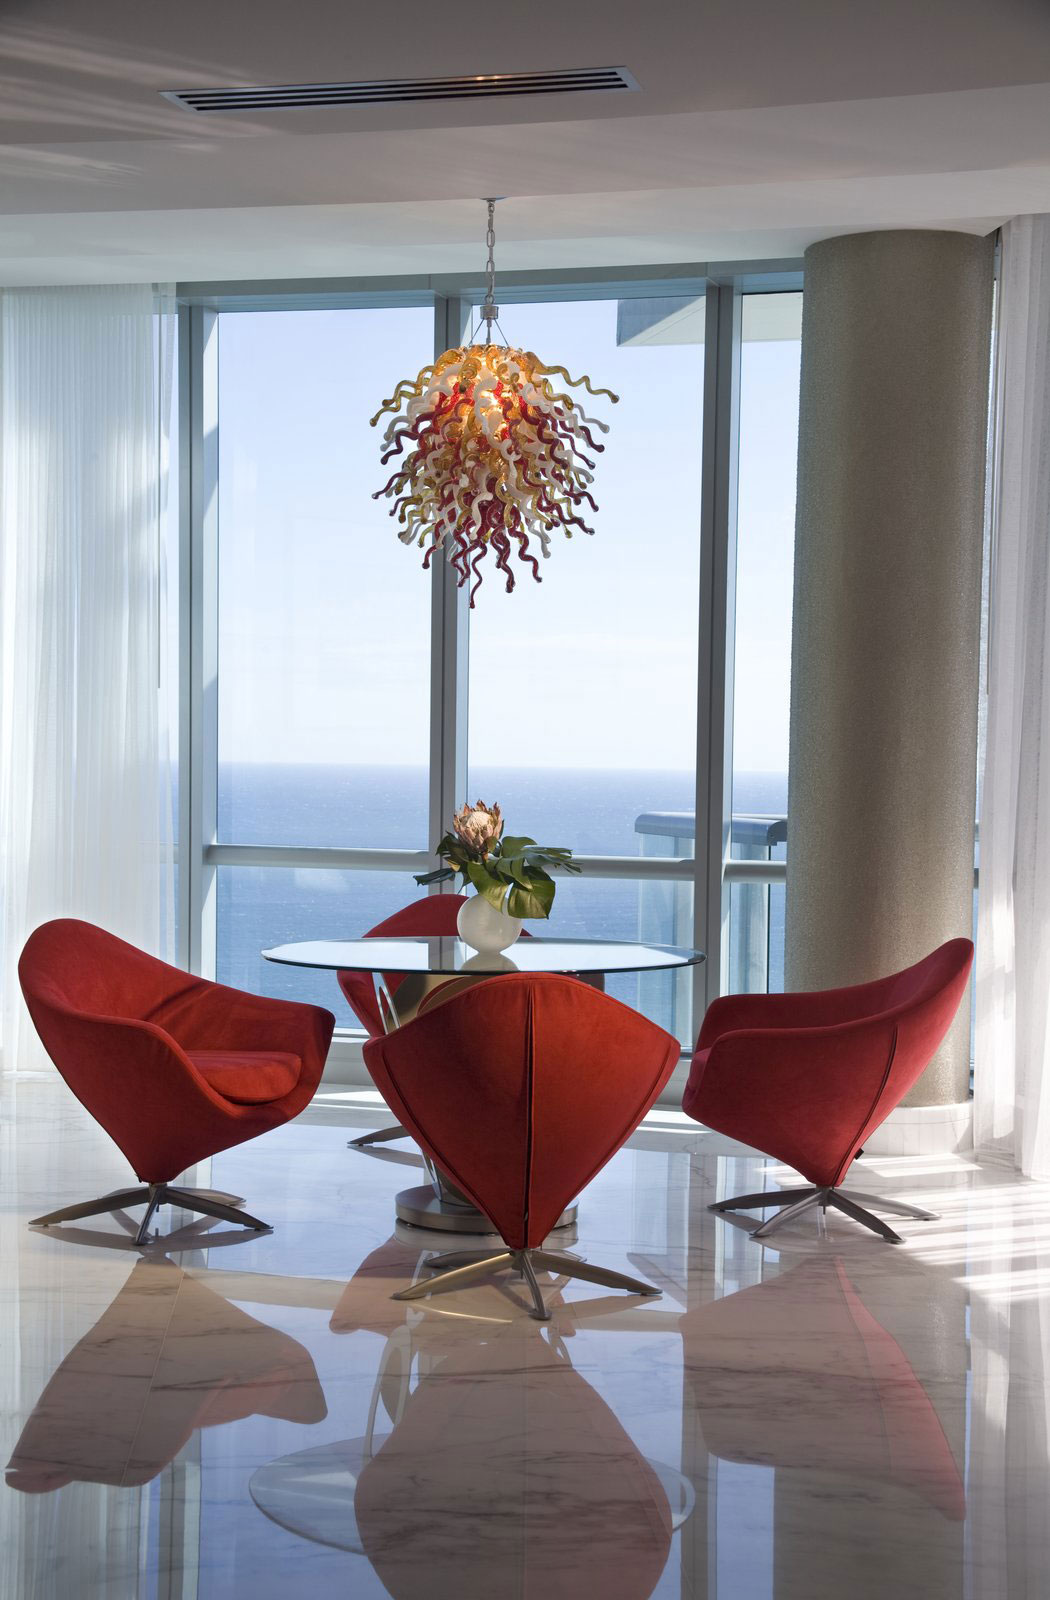 A-Contemporary-Design-Of-A-Penthouse-That-is-not-too-modern-or-cold-8 En modern design av en penthouse som inte är för modern eller kall